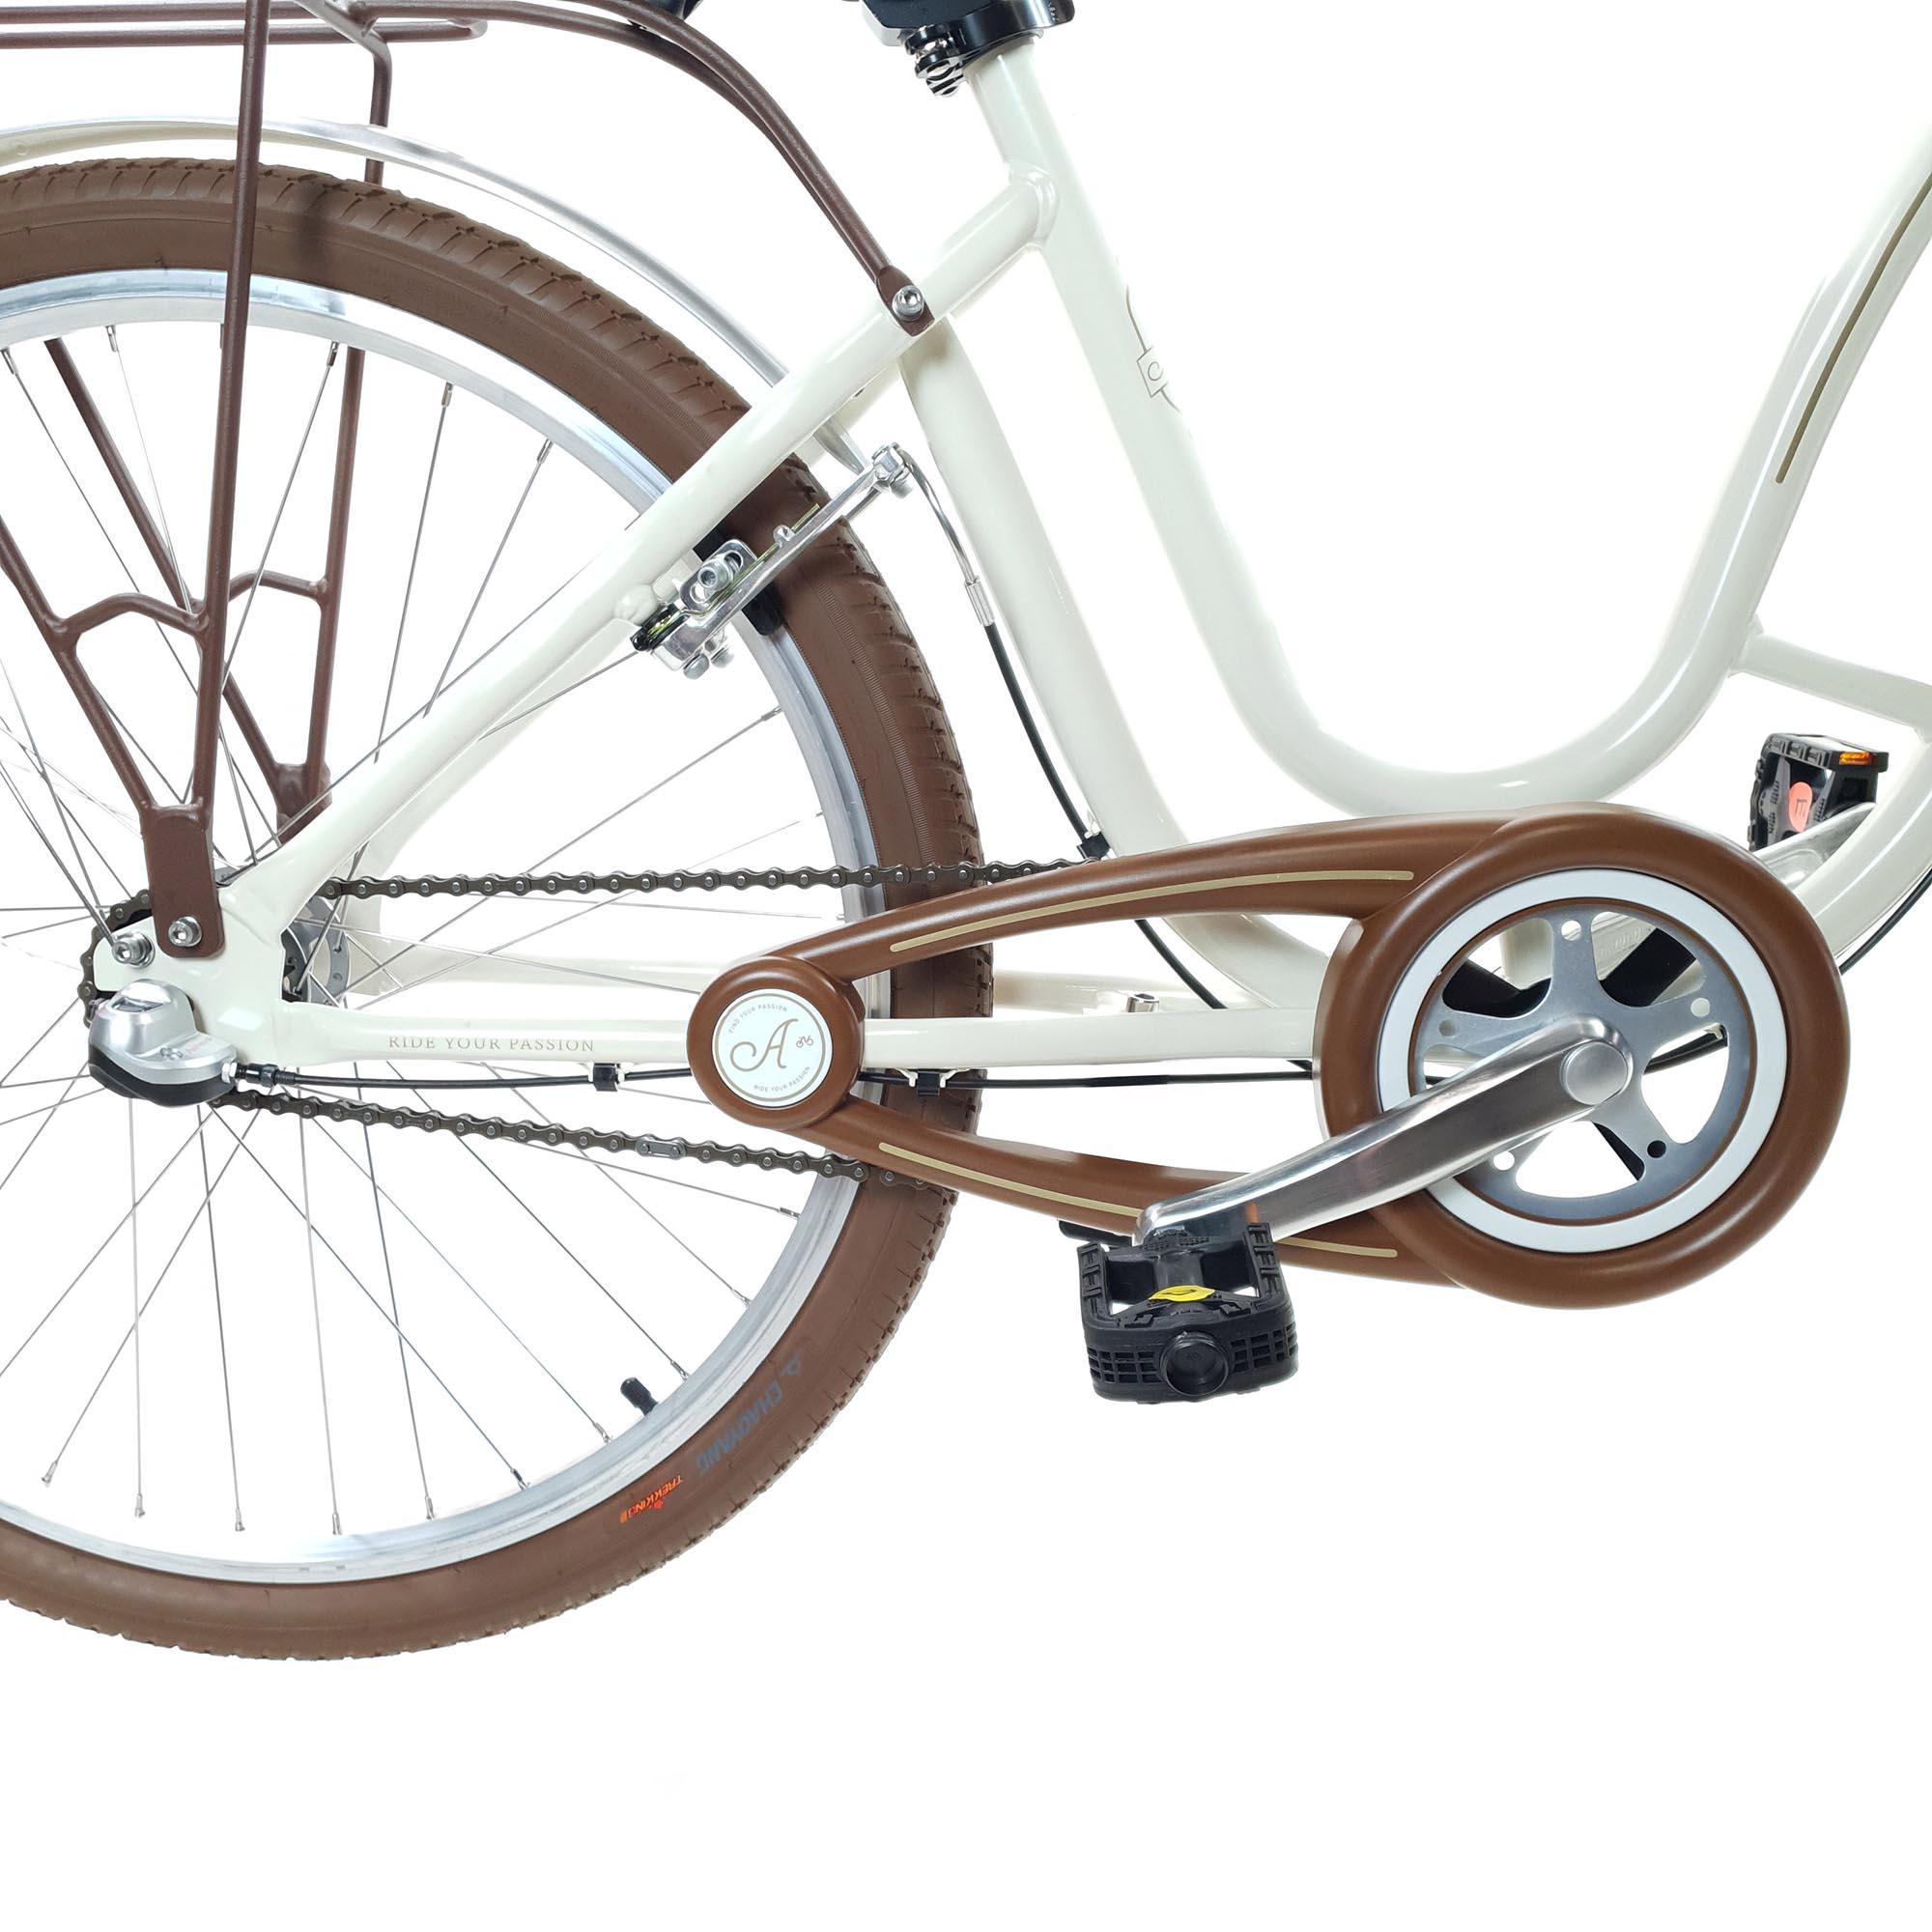 Bicicleta Nathor Aro 26 Aço Antonella Nexus 3v